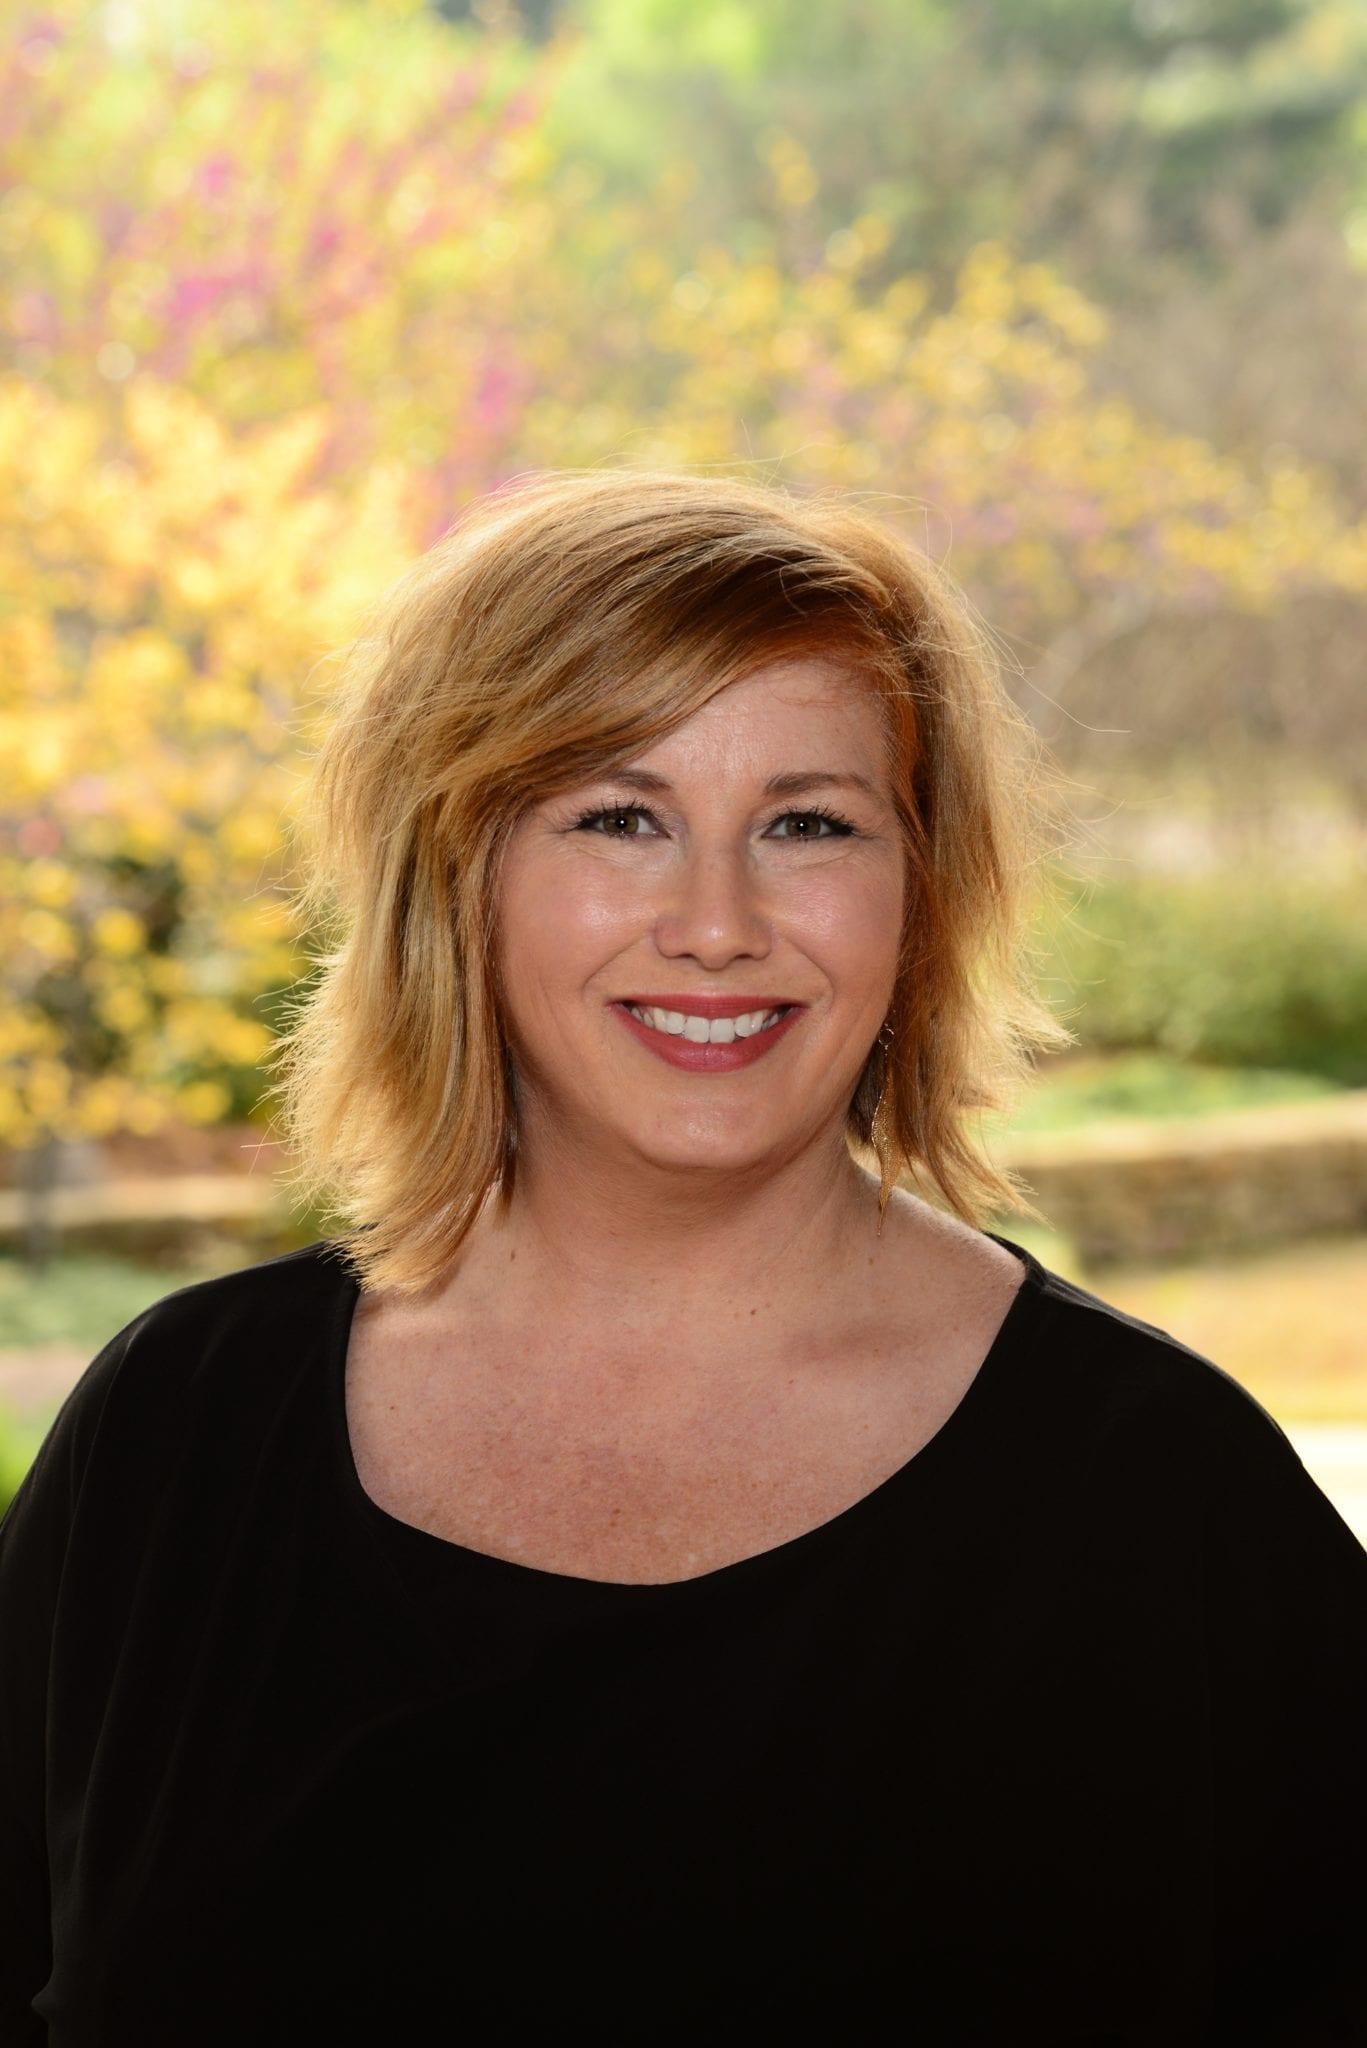 Jennifer Bailey, Director of Marketing & Community Outreach